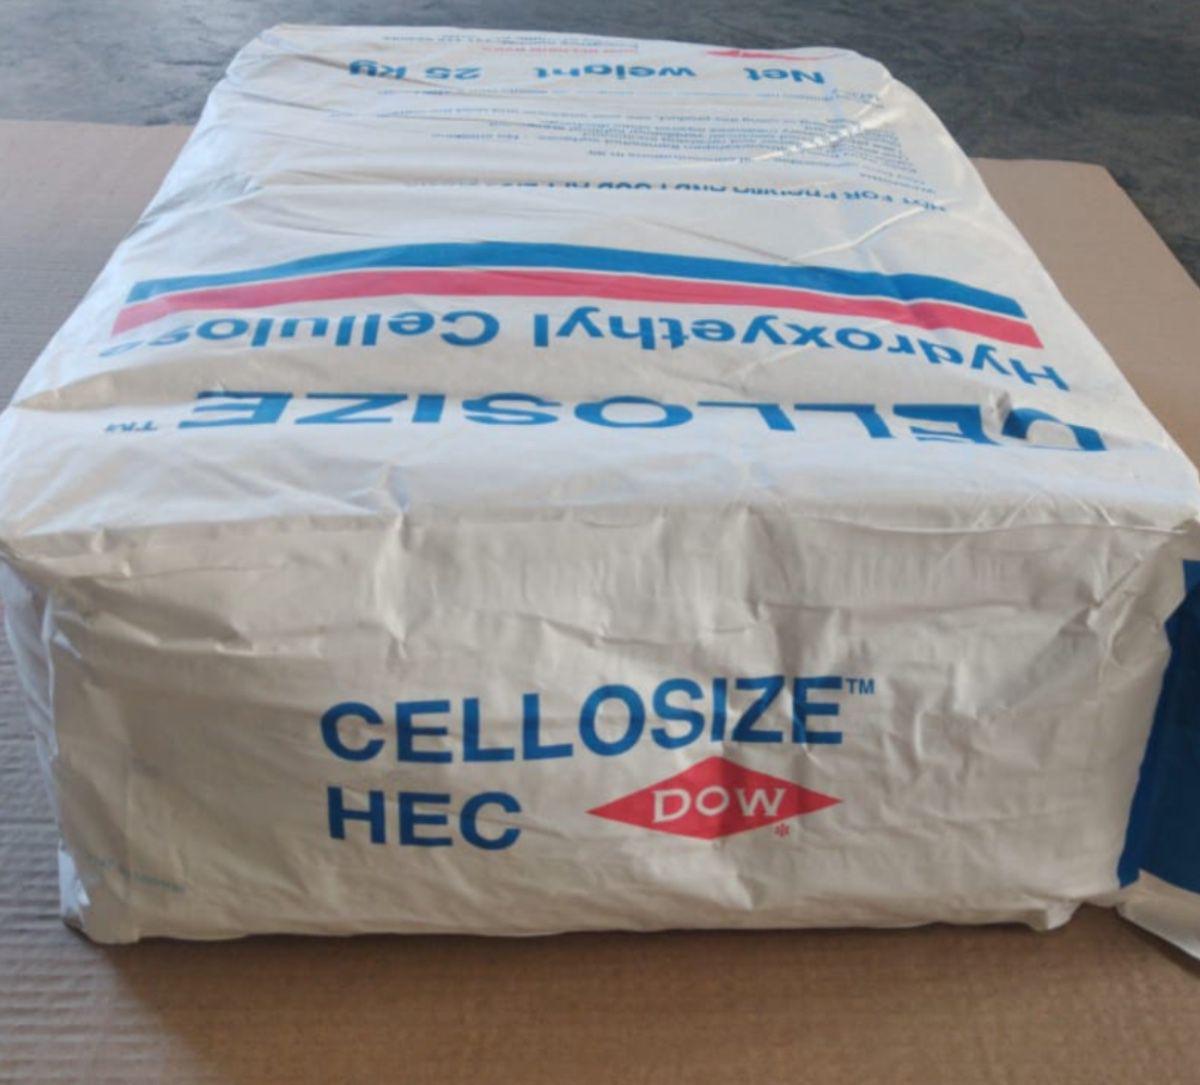 Espessante Cellosize QP 100 Dow Substituto Carbopol 940 2kg